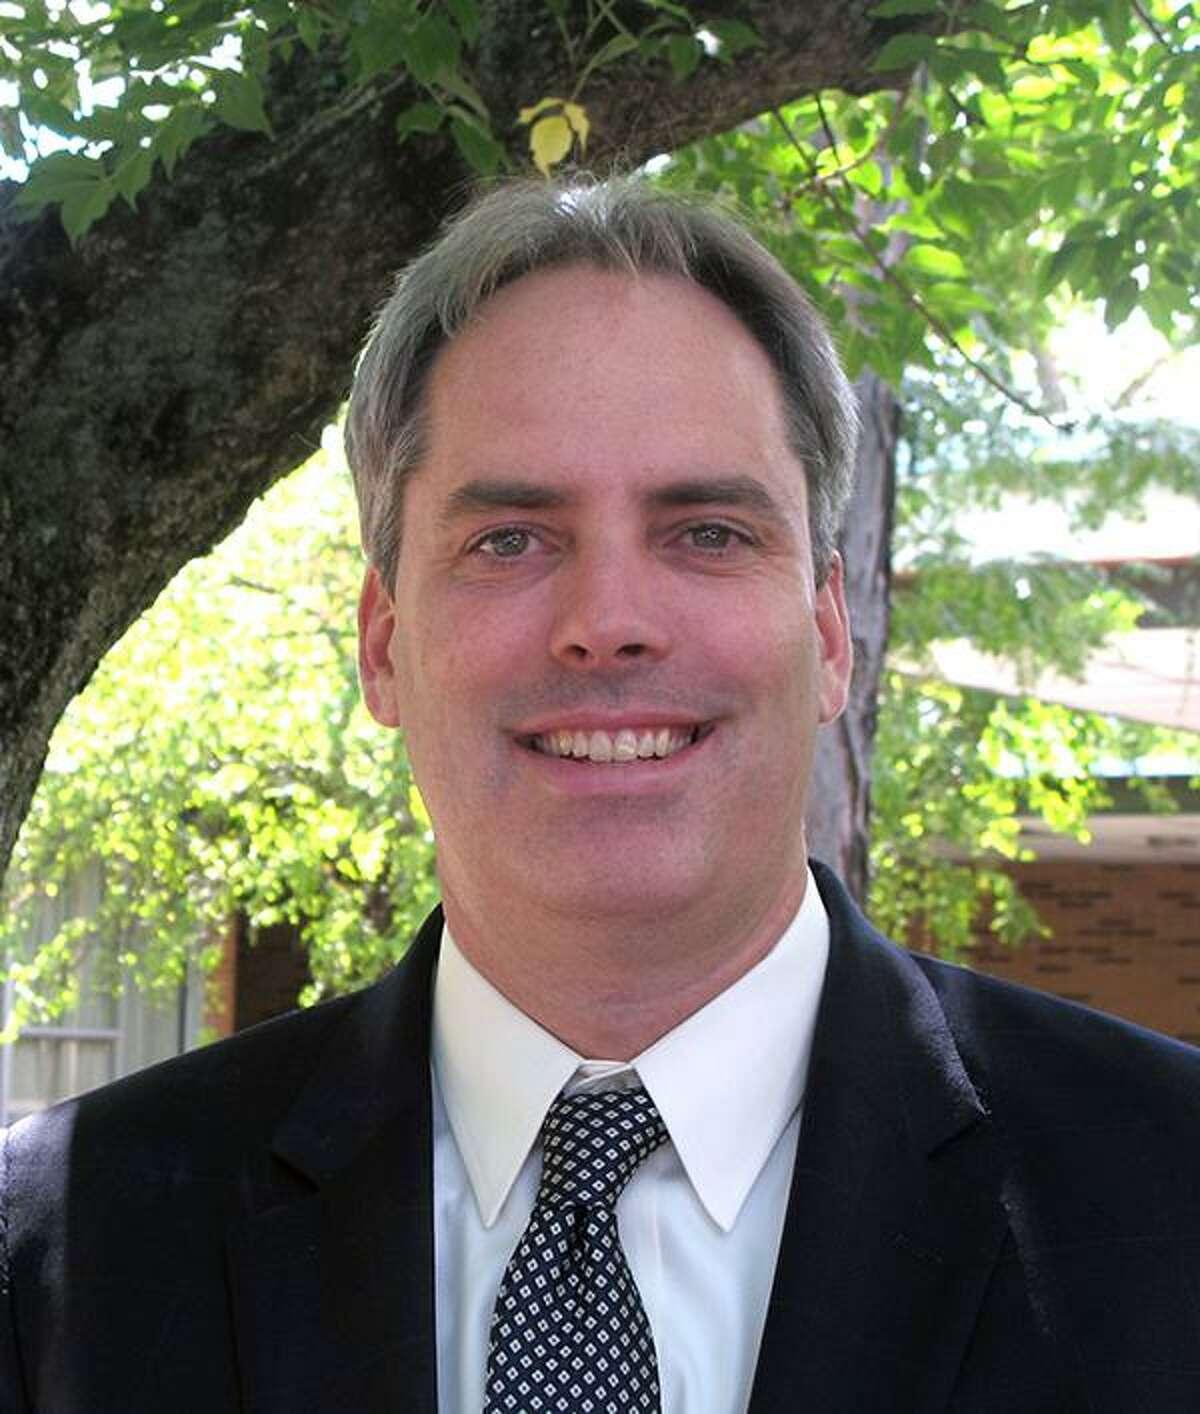 Madison Superintendent of Schools Craig Cooke